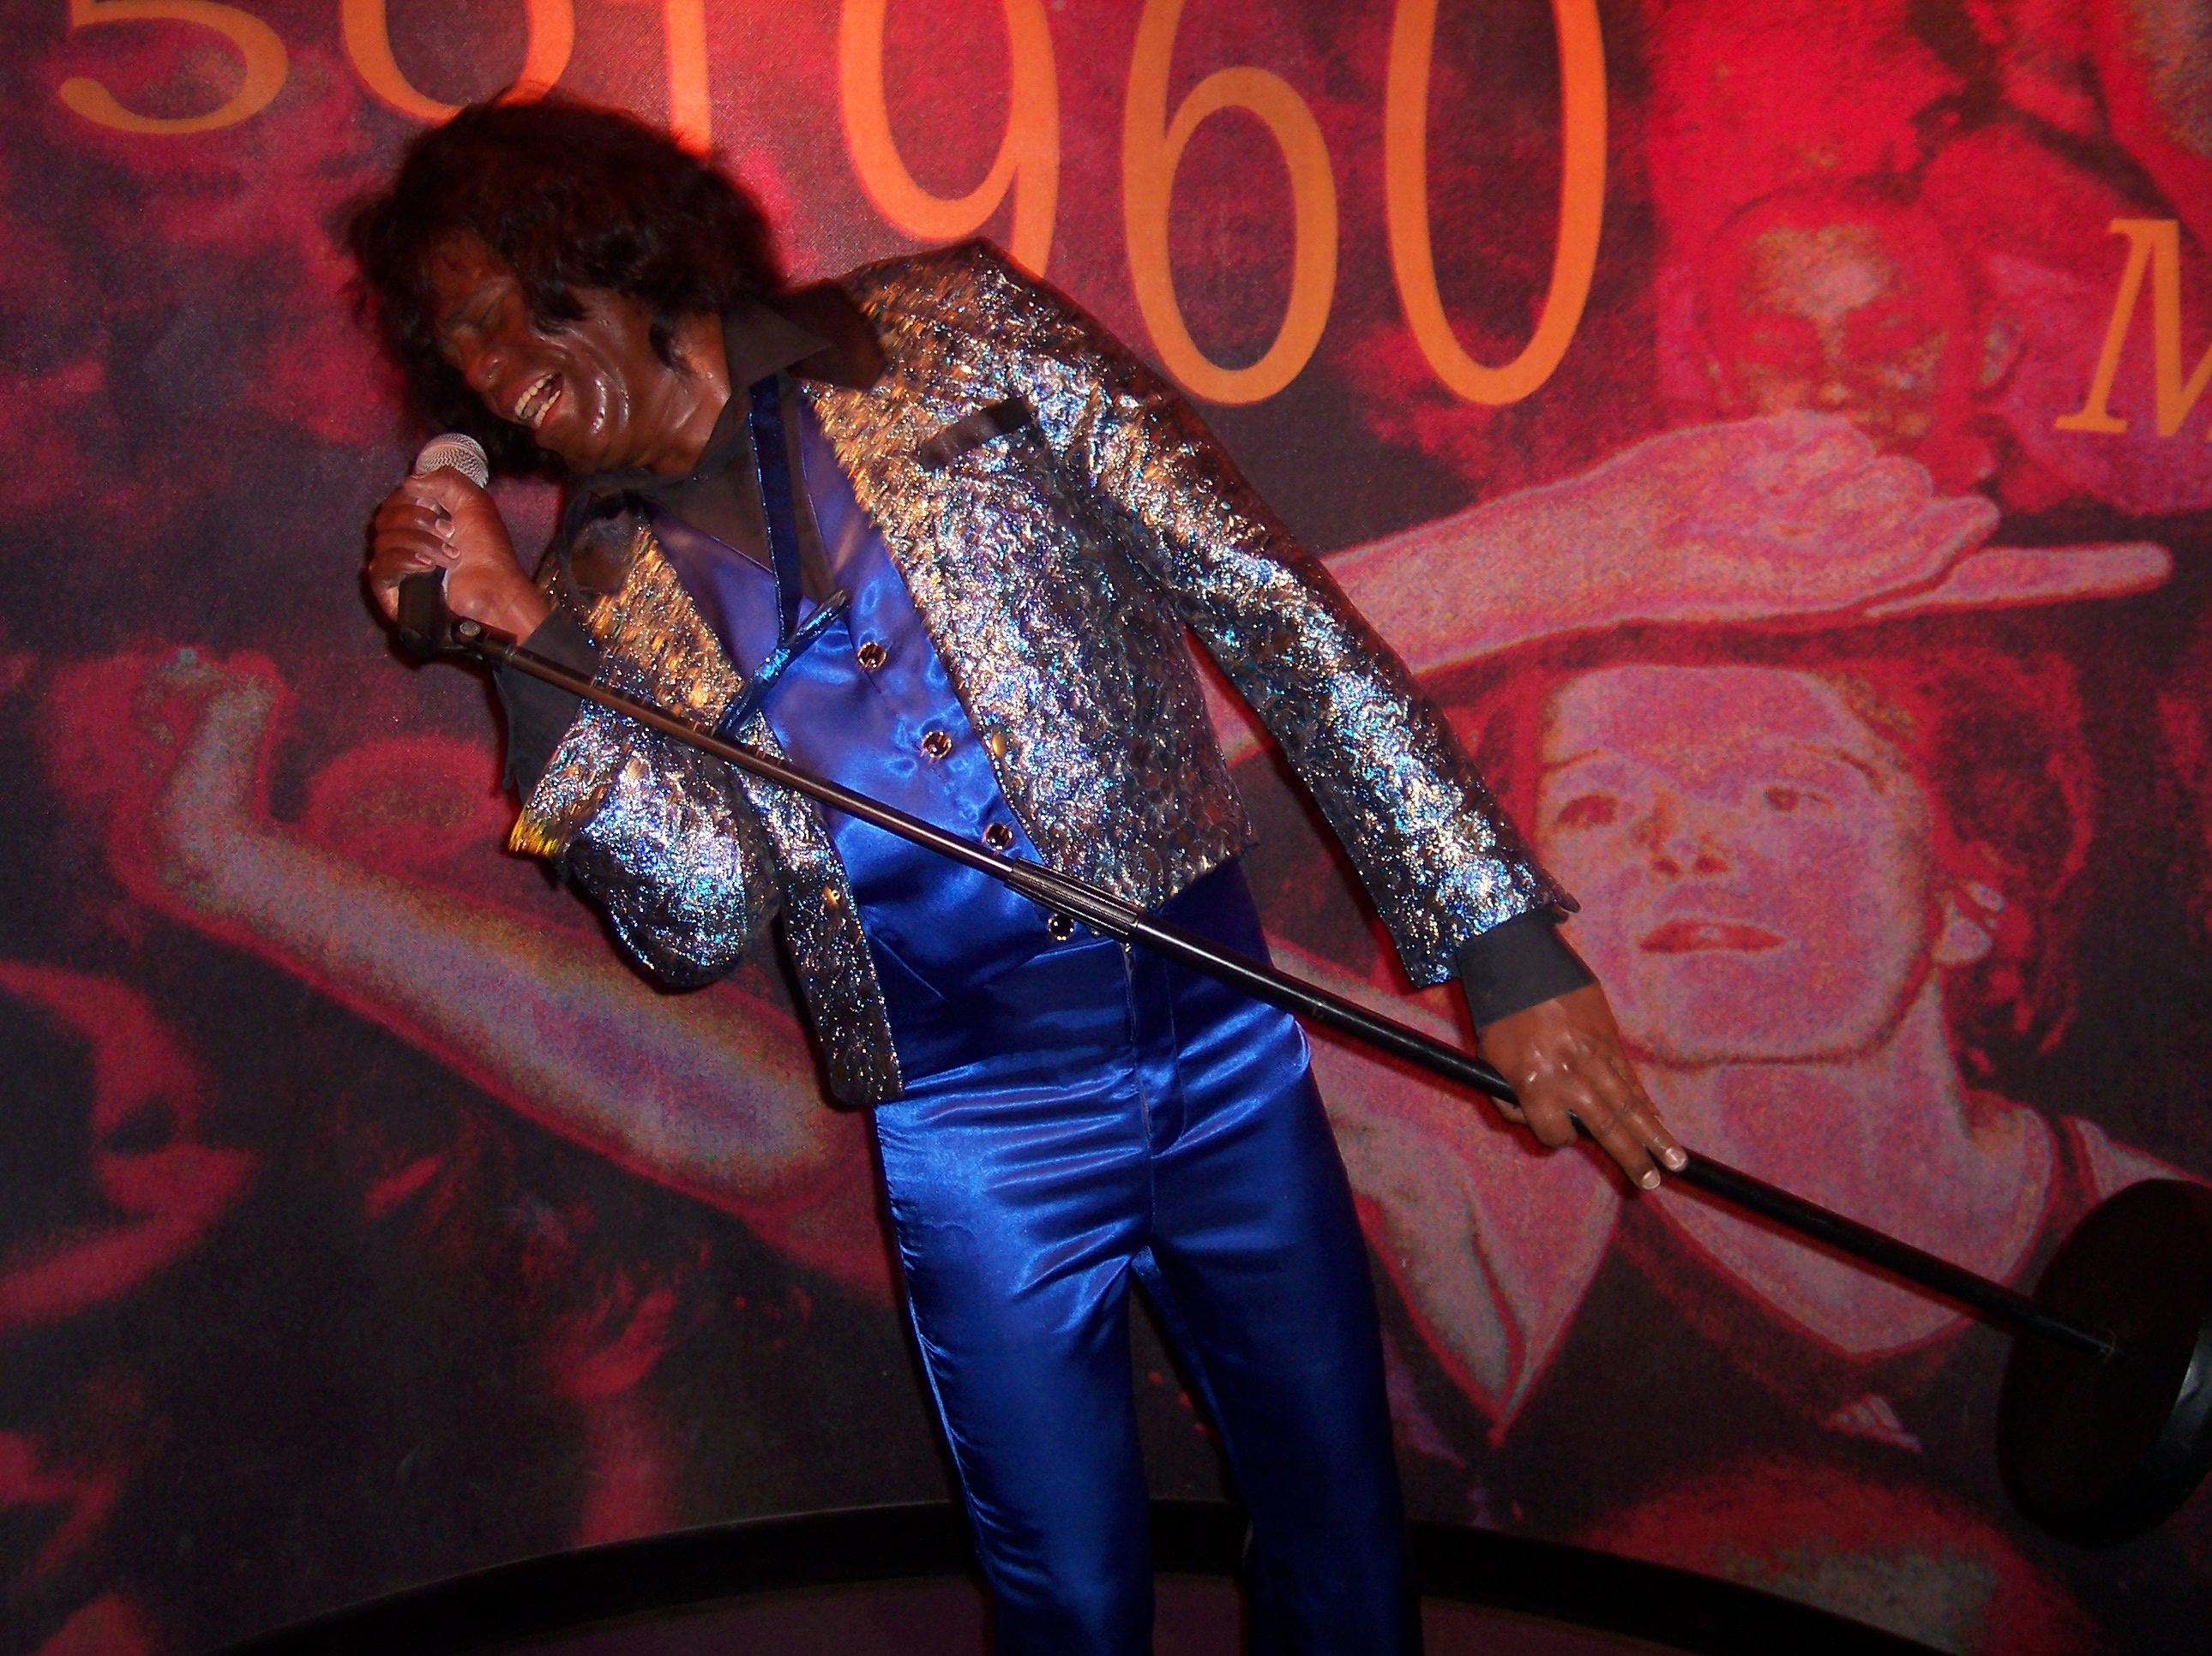 dario nature character humanoids man jamesbrown singer music artist performance waxmuseum puppet